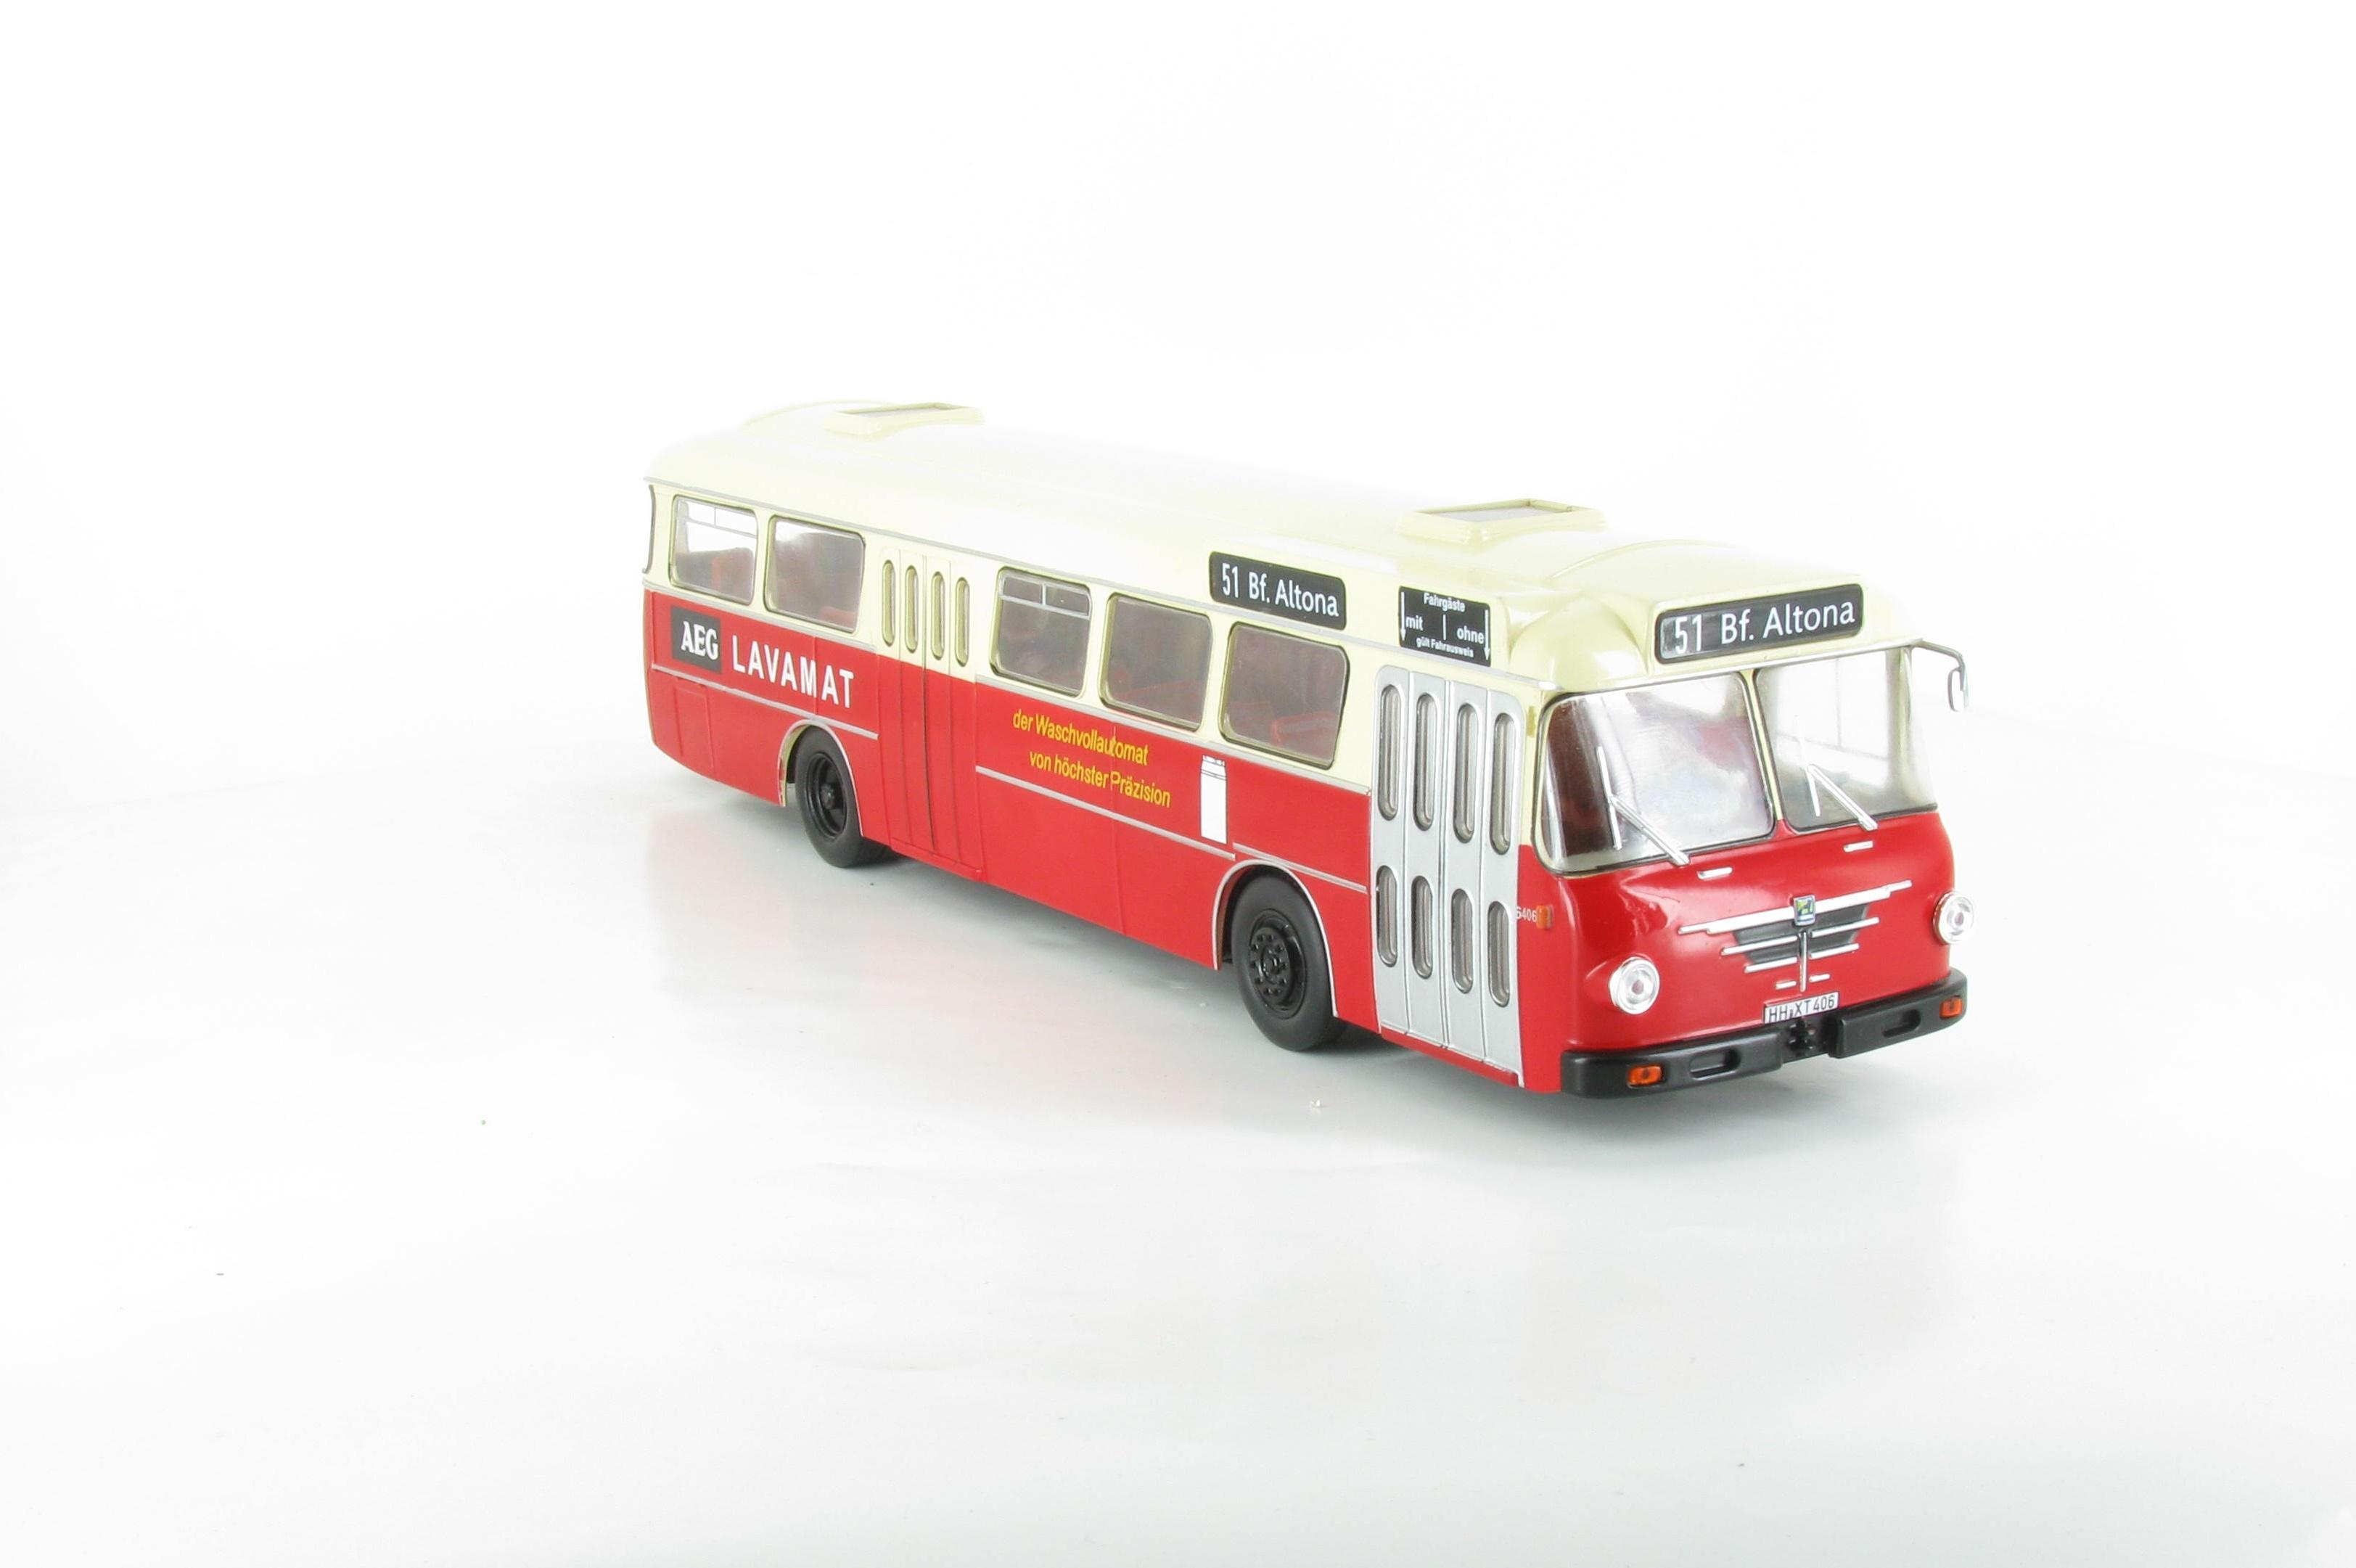 modellspielwaren reinhardt 1 43 ixo b ssing senator hamburg hhv bus 57. Black Bedroom Furniture Sets. Home Design Ideas